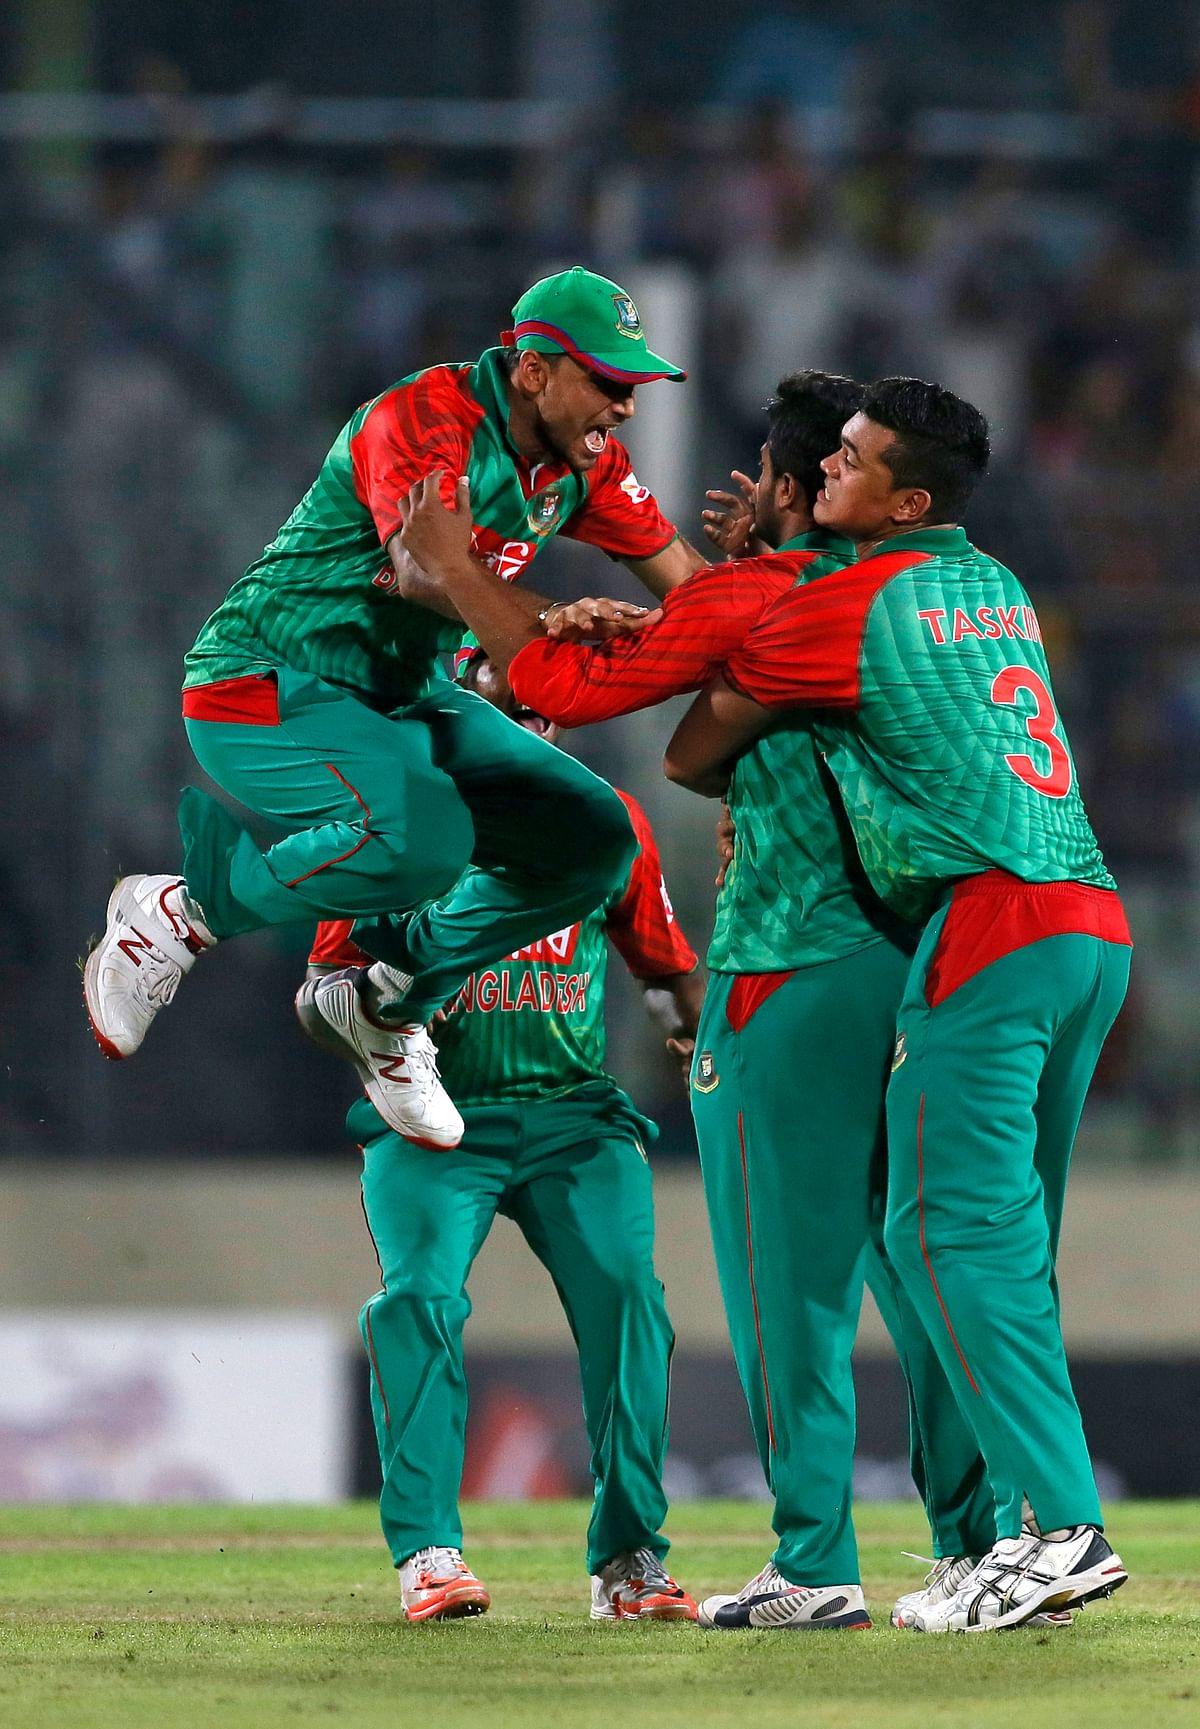 Bangladesh's Shakib Al Hasan, second right, celebrates with captain Mashrafe Mortaza, left, after the dismissal of MS Dhoni. (Photo : AP)